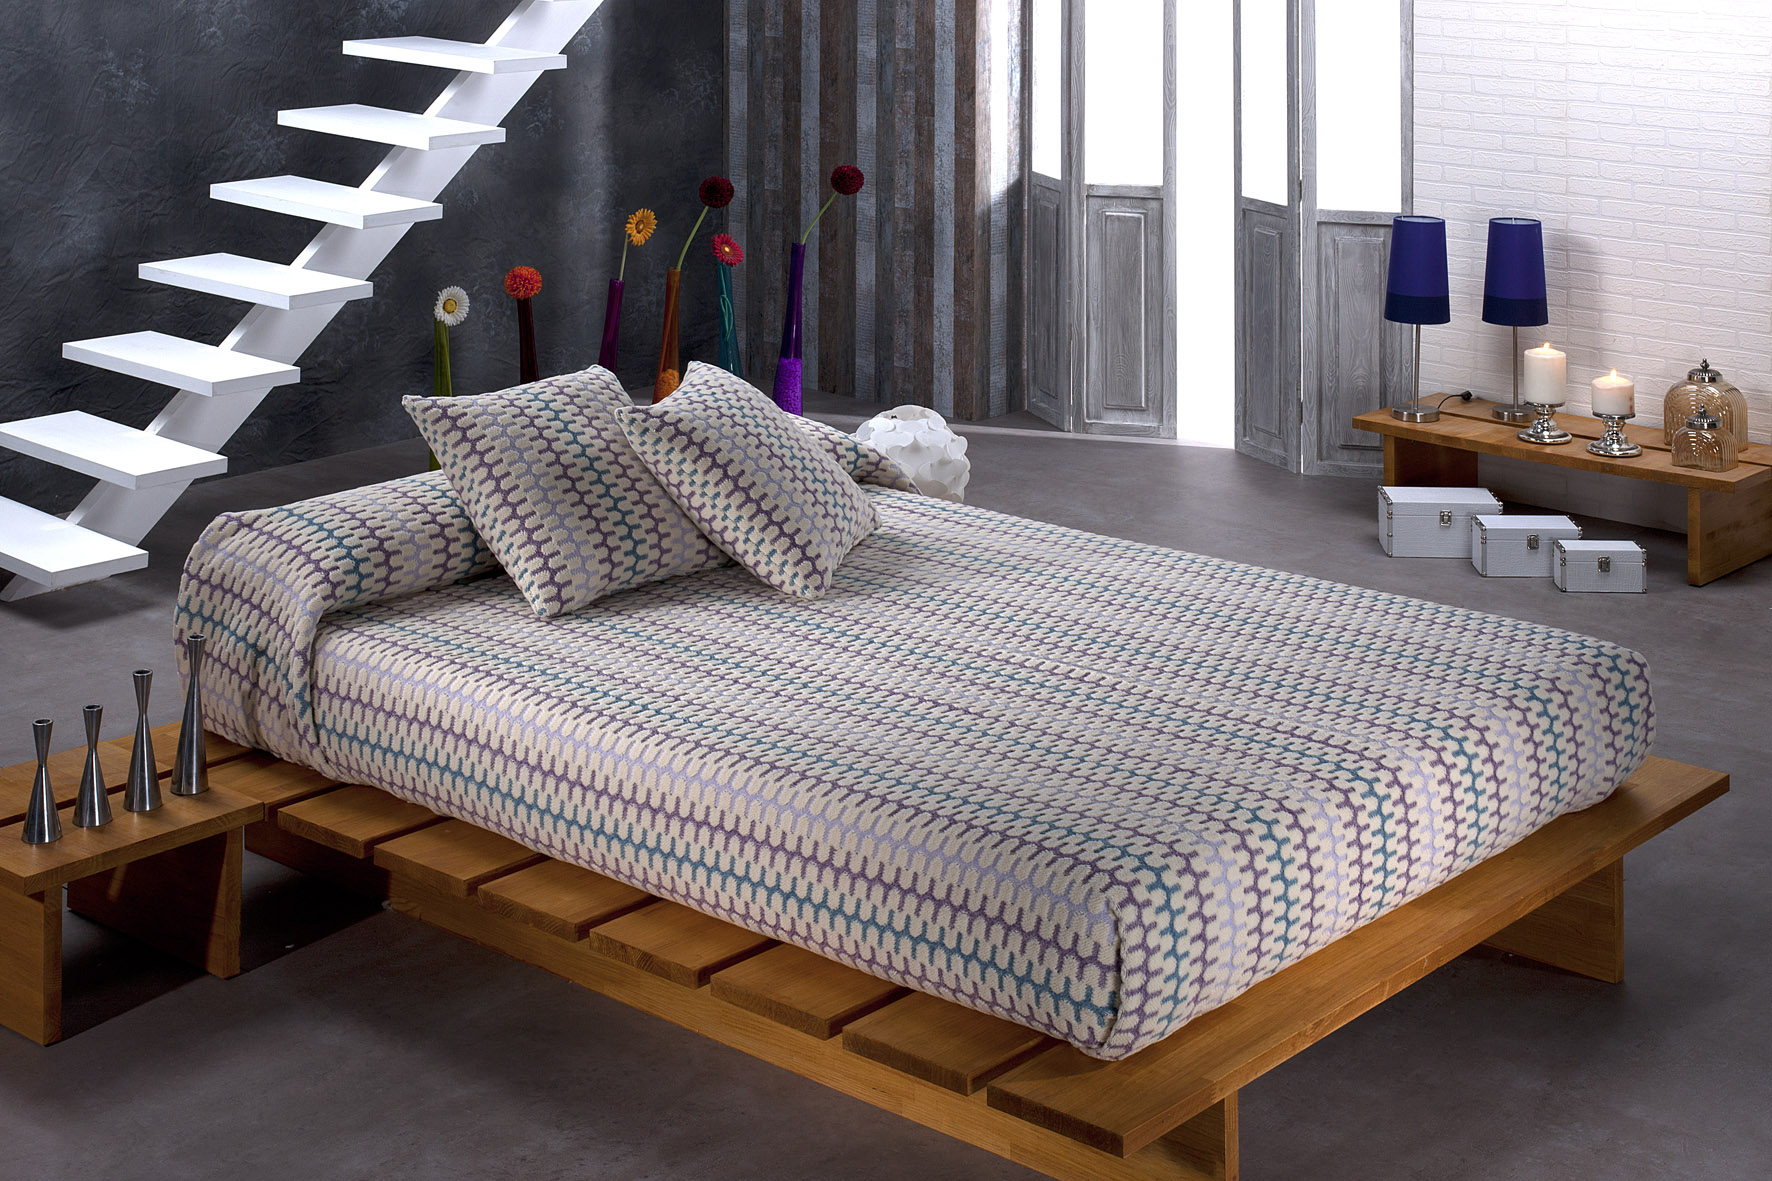 Colchas de cama textils mora colecci n 2013 colchas en for Cobertor cama